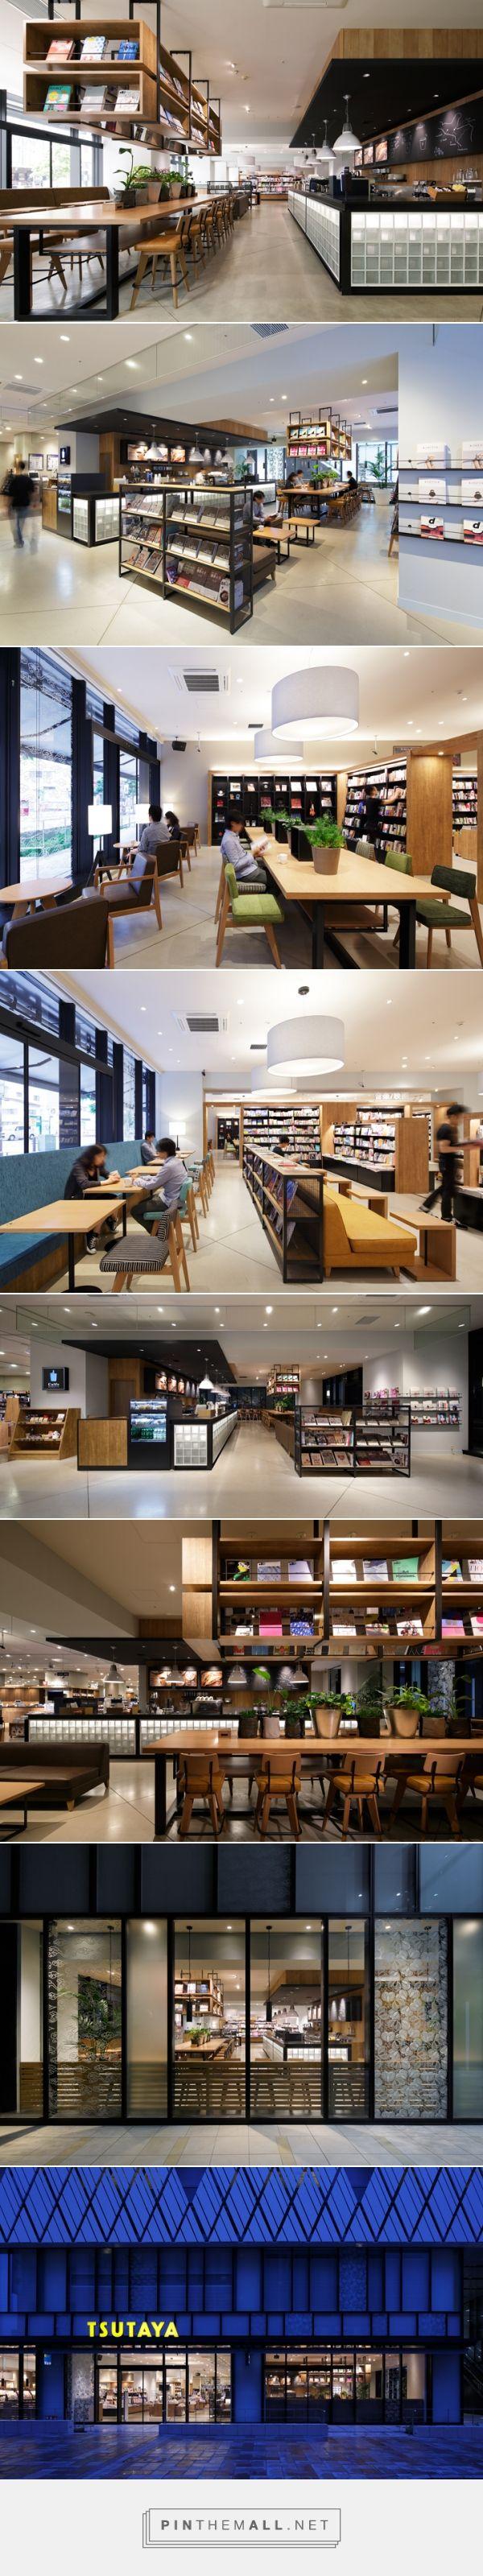 "It is a plan of BOOK & CAFE ""Culfe"" in""TSUTAYA Sumiya Shizuoka ..."